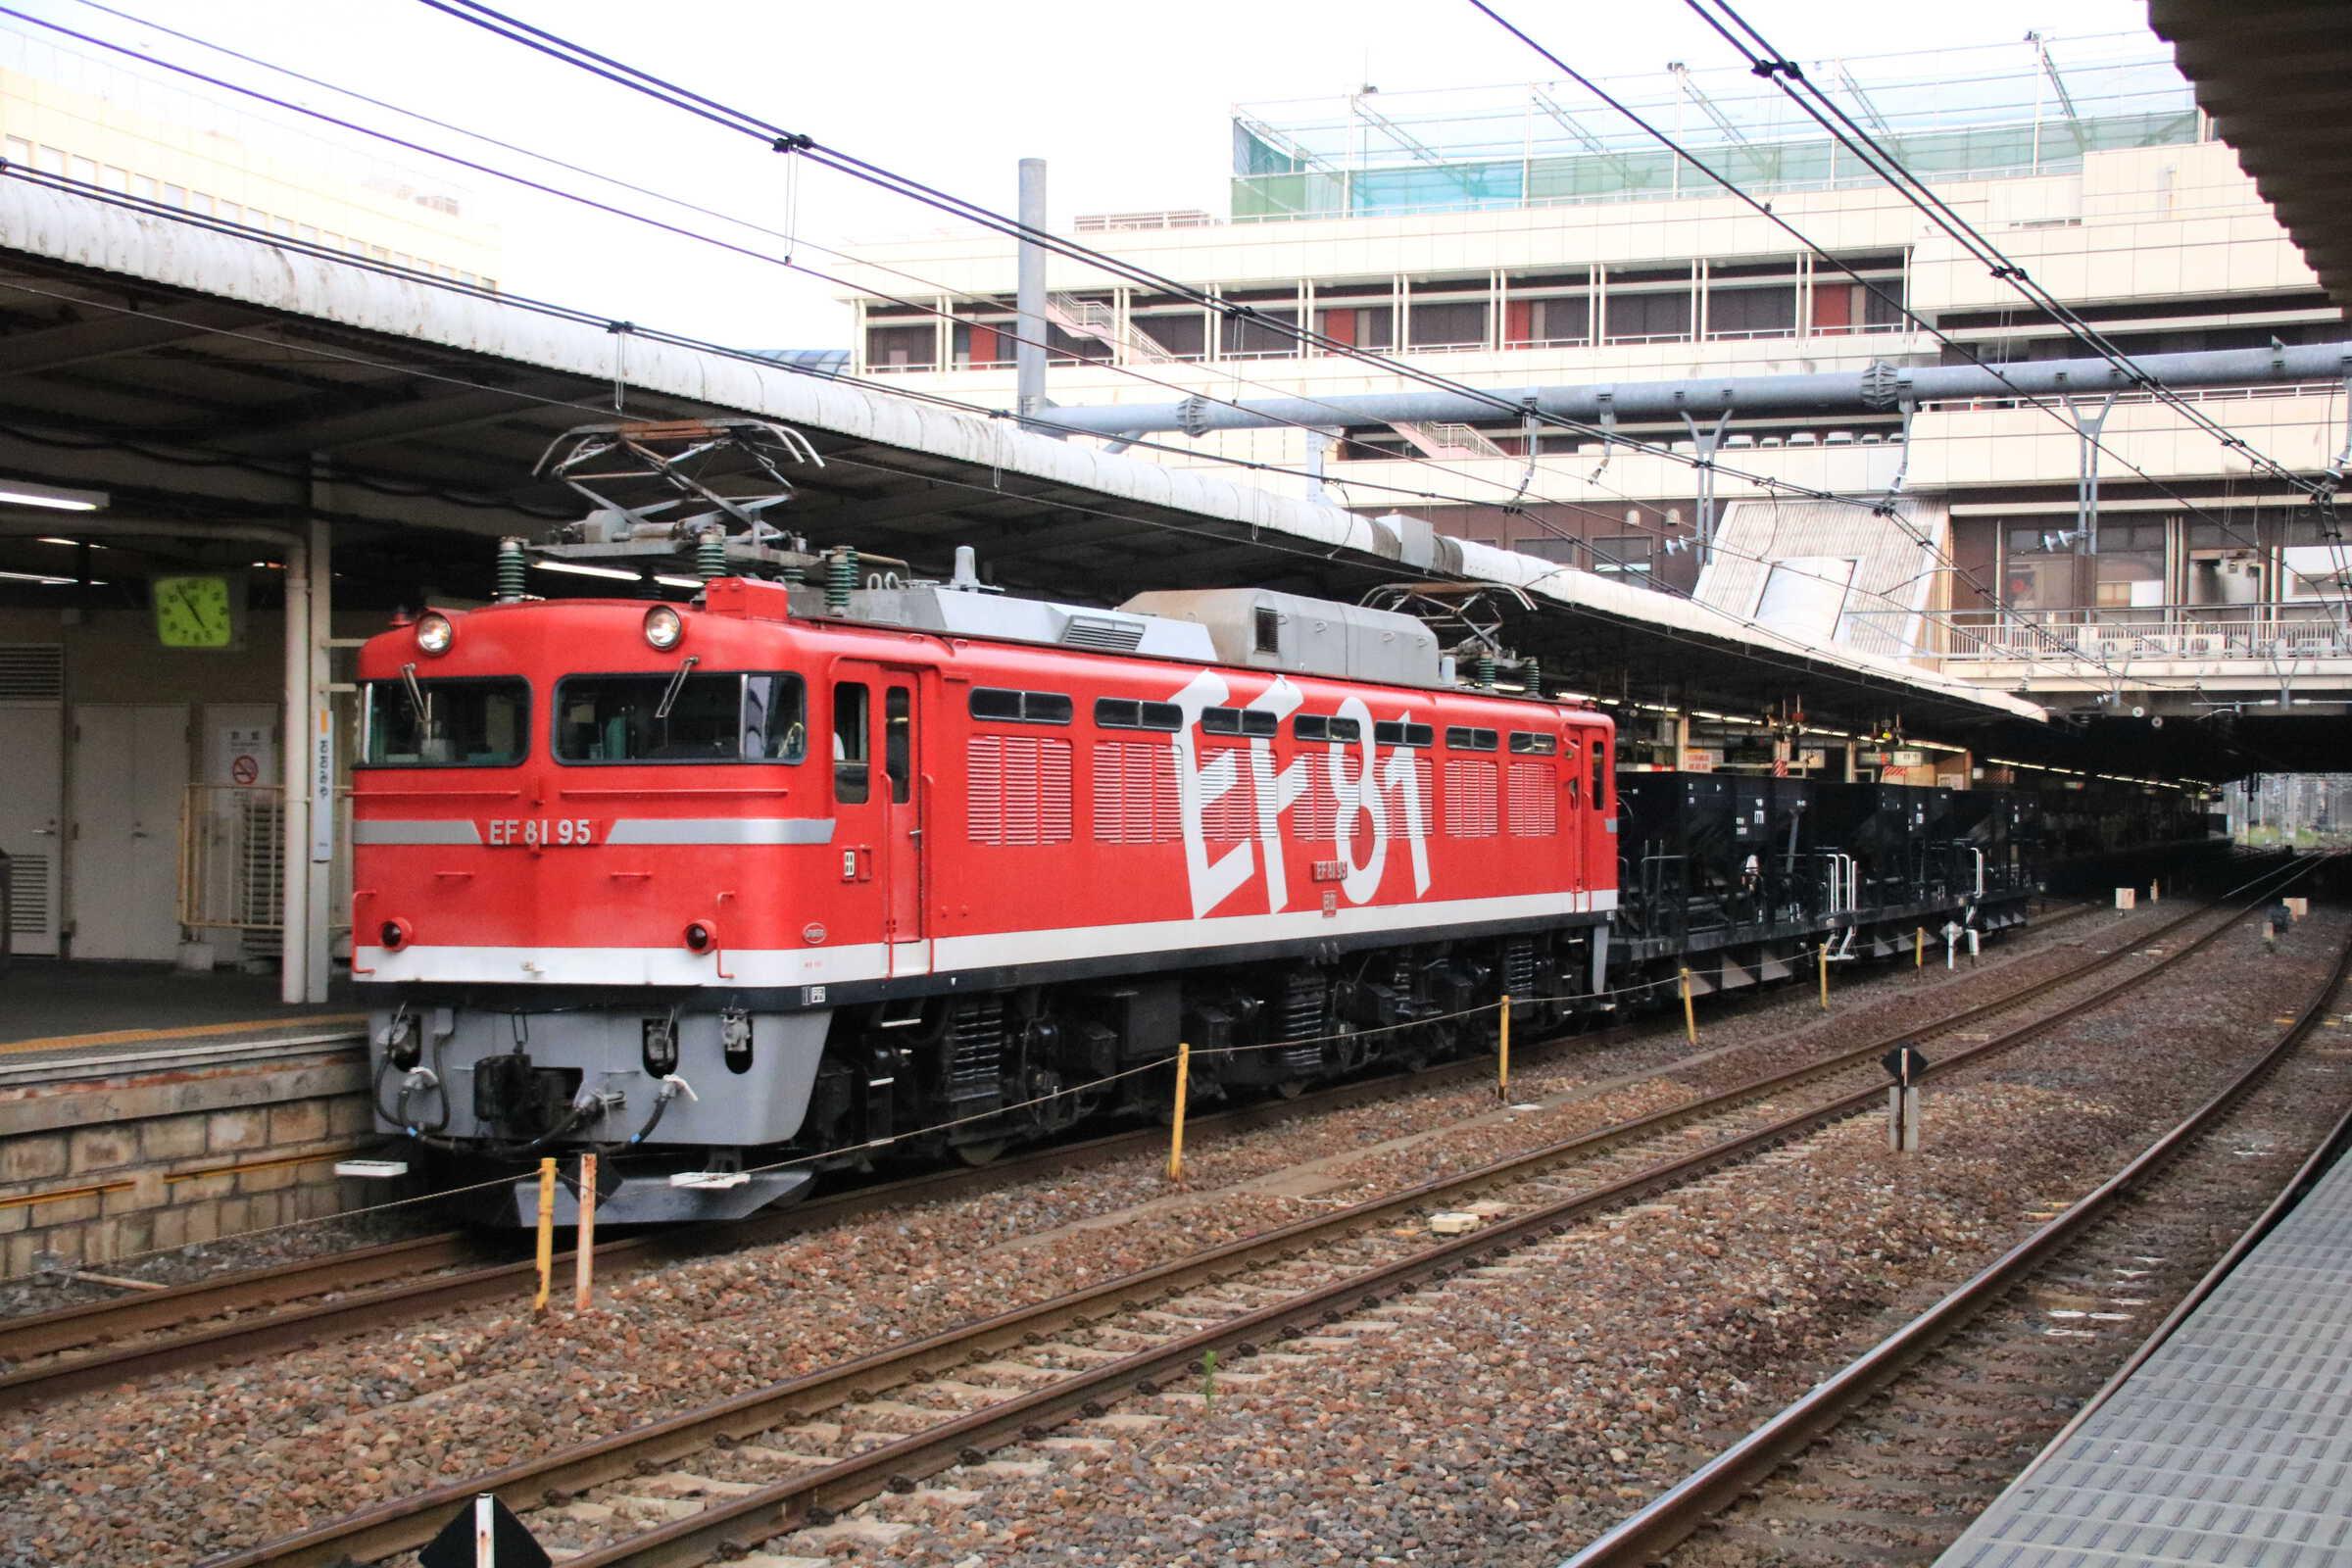 配8937列車 交検出場配給 EF81-95+ホキ3両